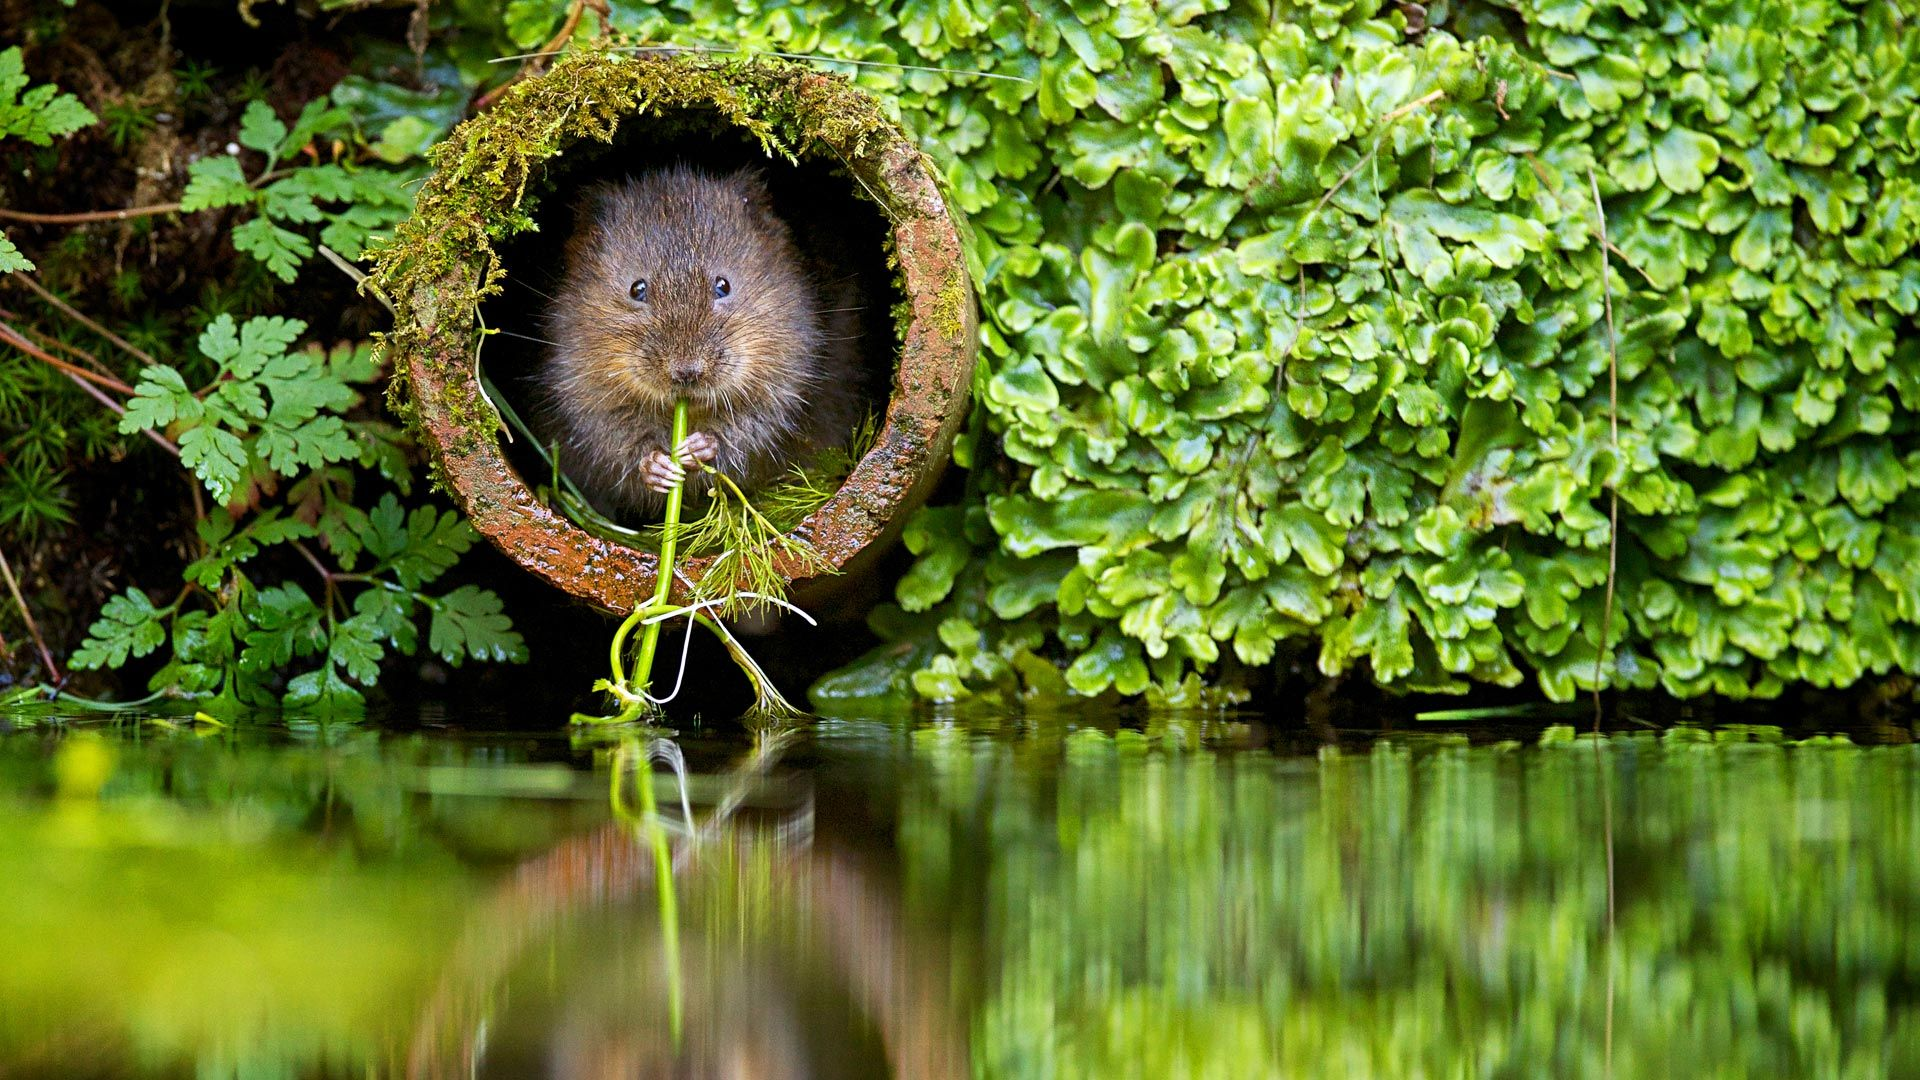 Windows 10 Lock Screen Dump Water Vole Flossing Animals